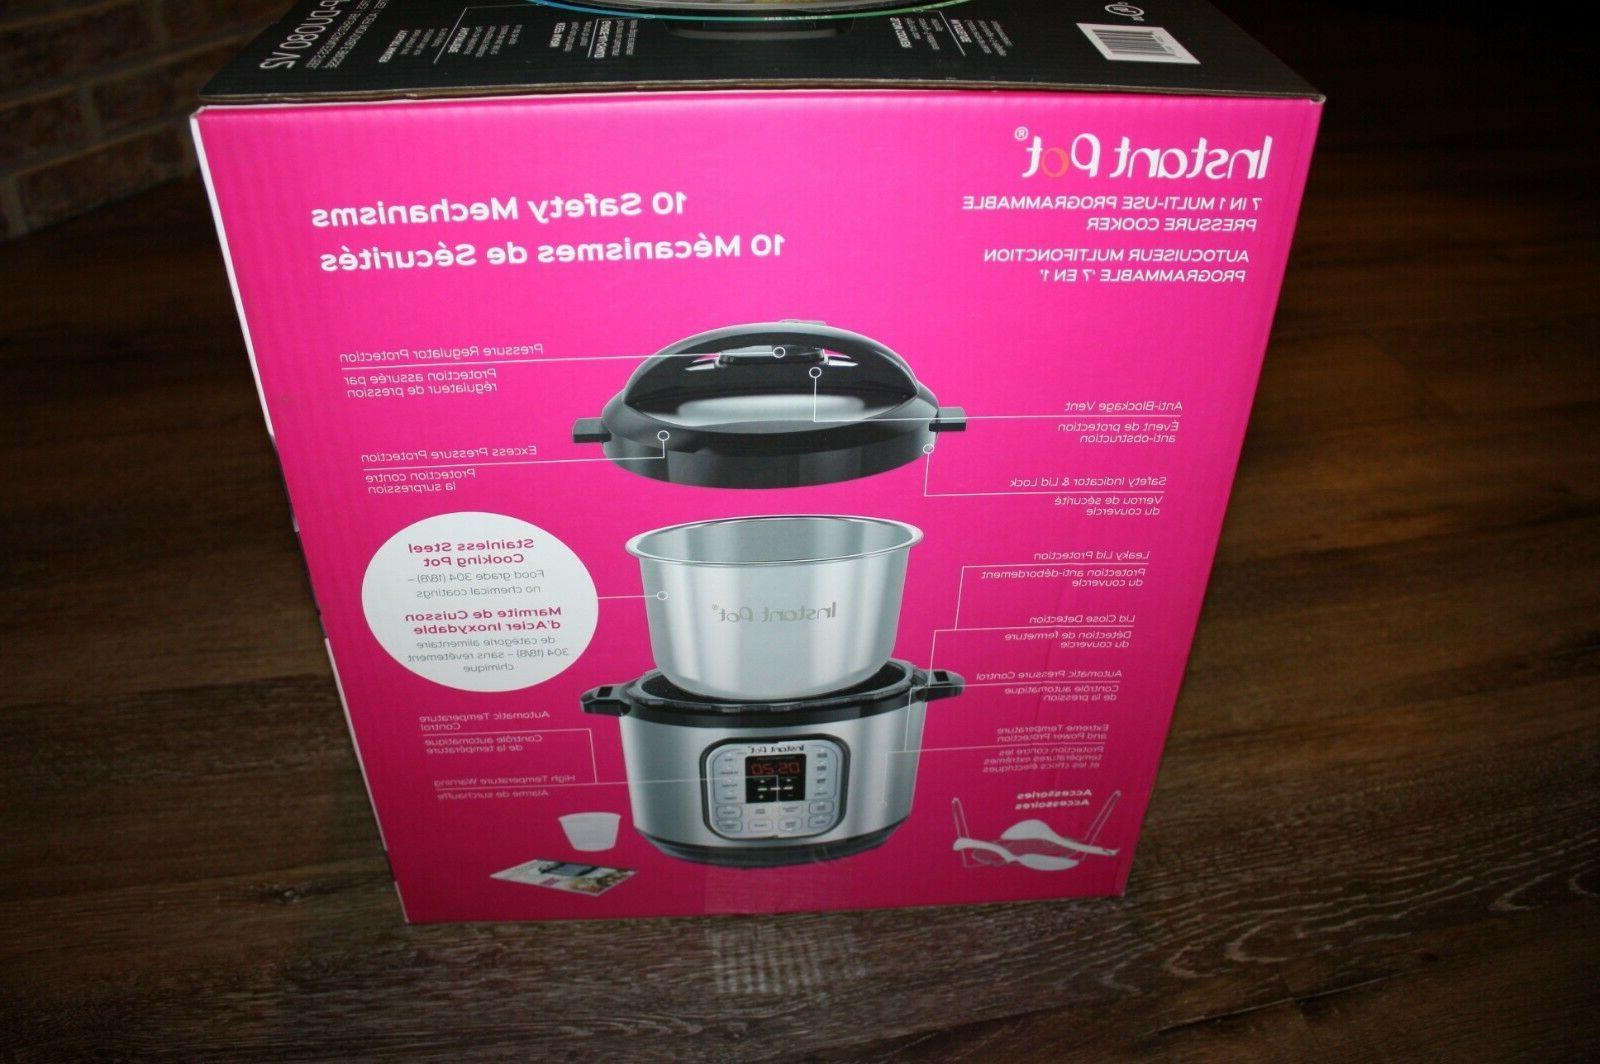 New Instant Pot 8 Qt Multi-Use Pressure Cooker - V2